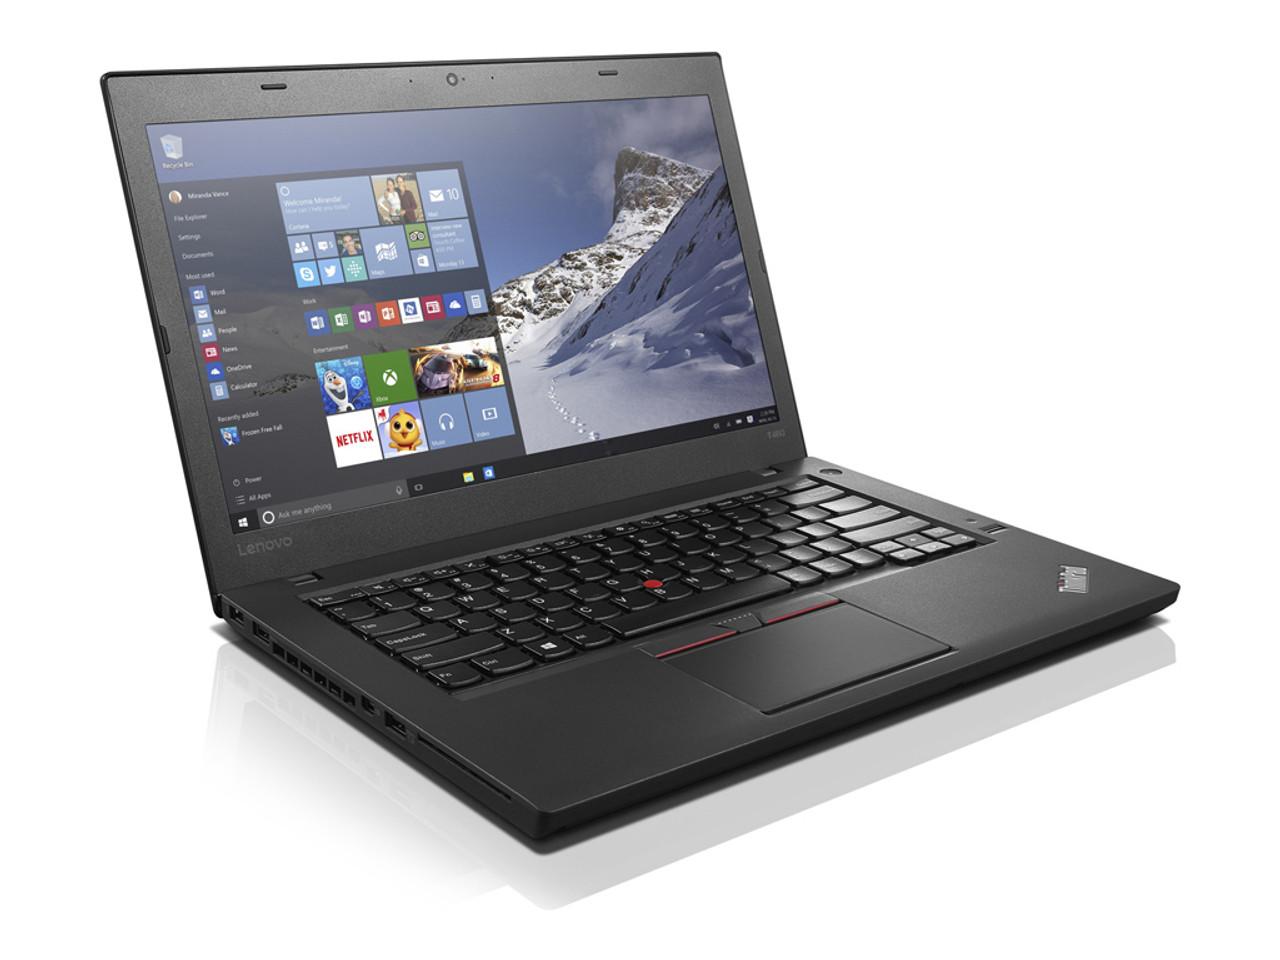 IBM Lenovo Thinkpad T460 Laptop Core i5 2.3GHz, 8GB Ram, 250GB SSD, Windows 10 Pro 64 Ultrabook Notebook